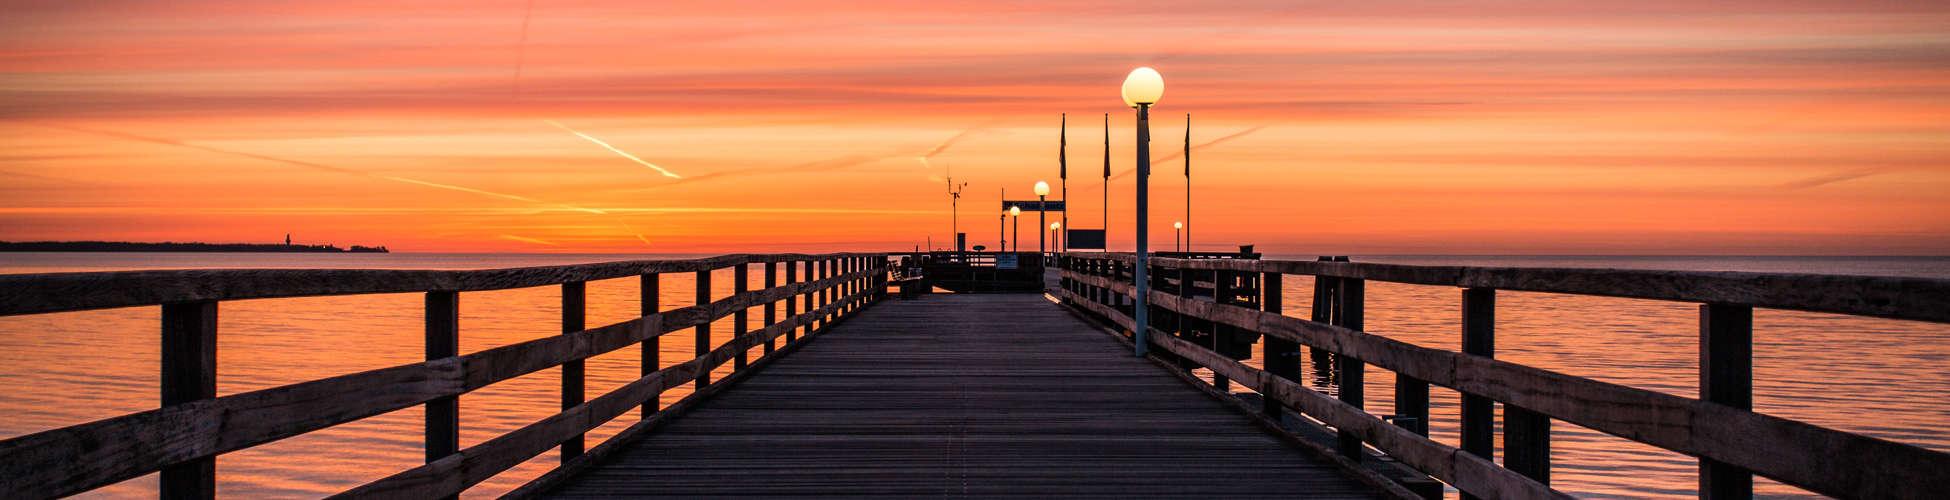 Seebrücke Scharbeutz im Sonnenaufgang